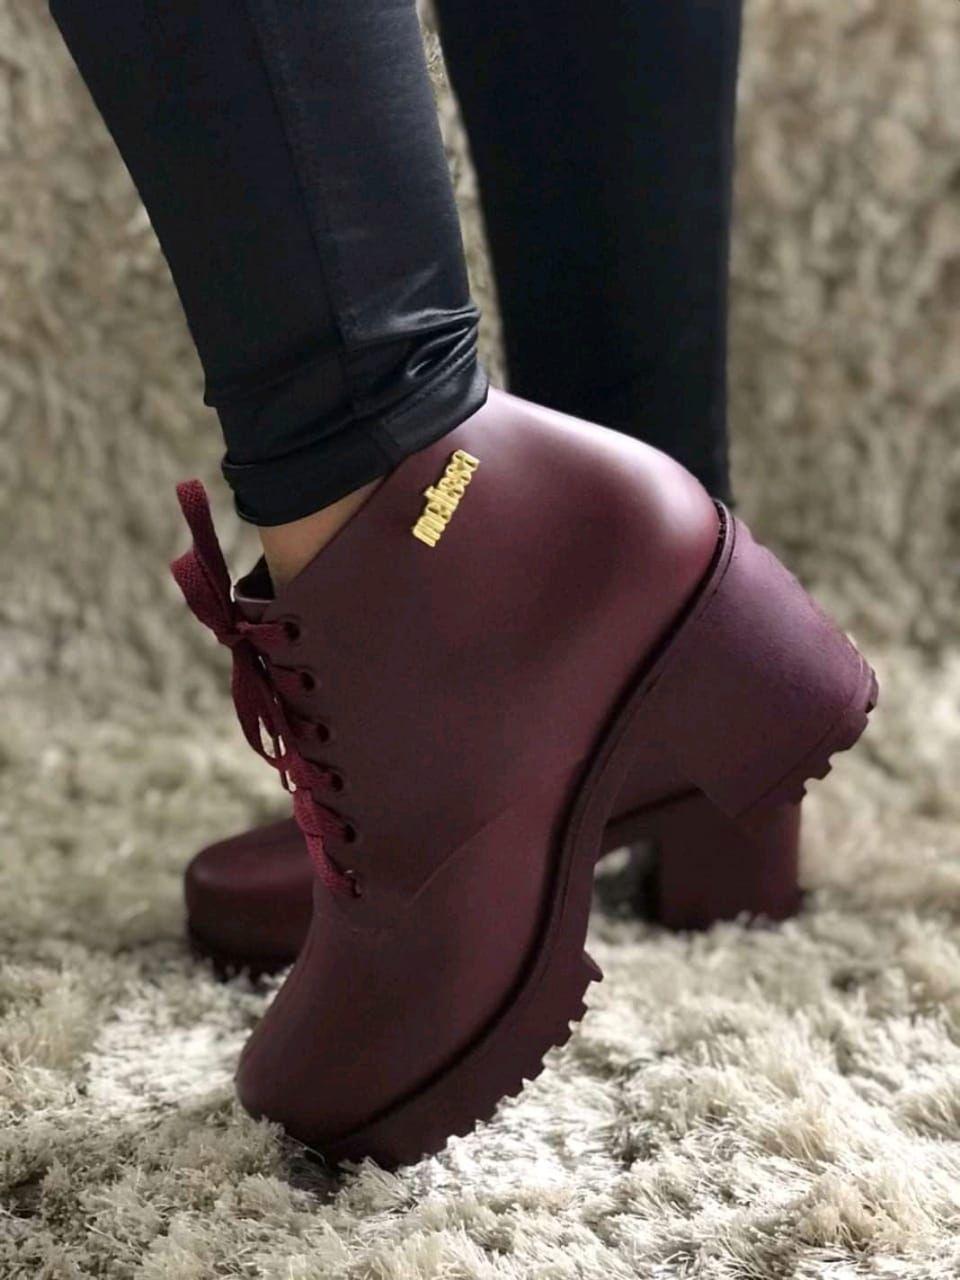 Acessórios | Pulseiras | Botas femininas, Sapatos fashion